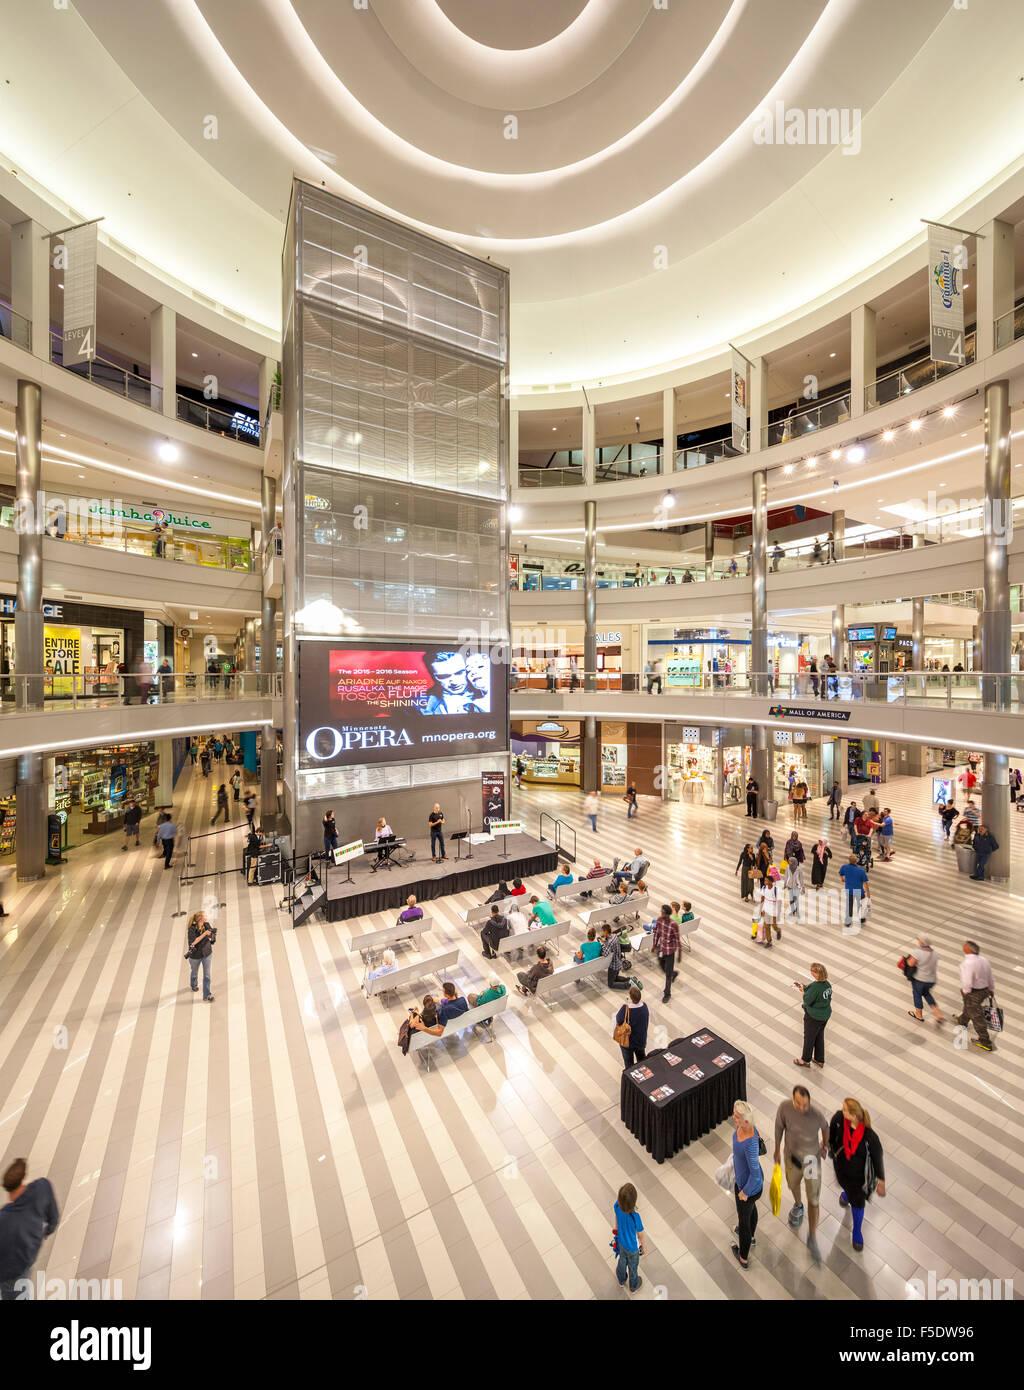 Minnesota Opera presentation inside Minneapolis Mall of America. Largest shopping mall in the US. Interior. - Stock Image